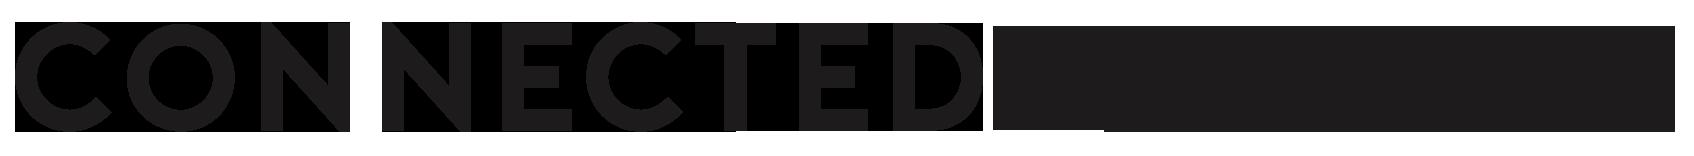 CW Logo 2017 3 - Large Colored